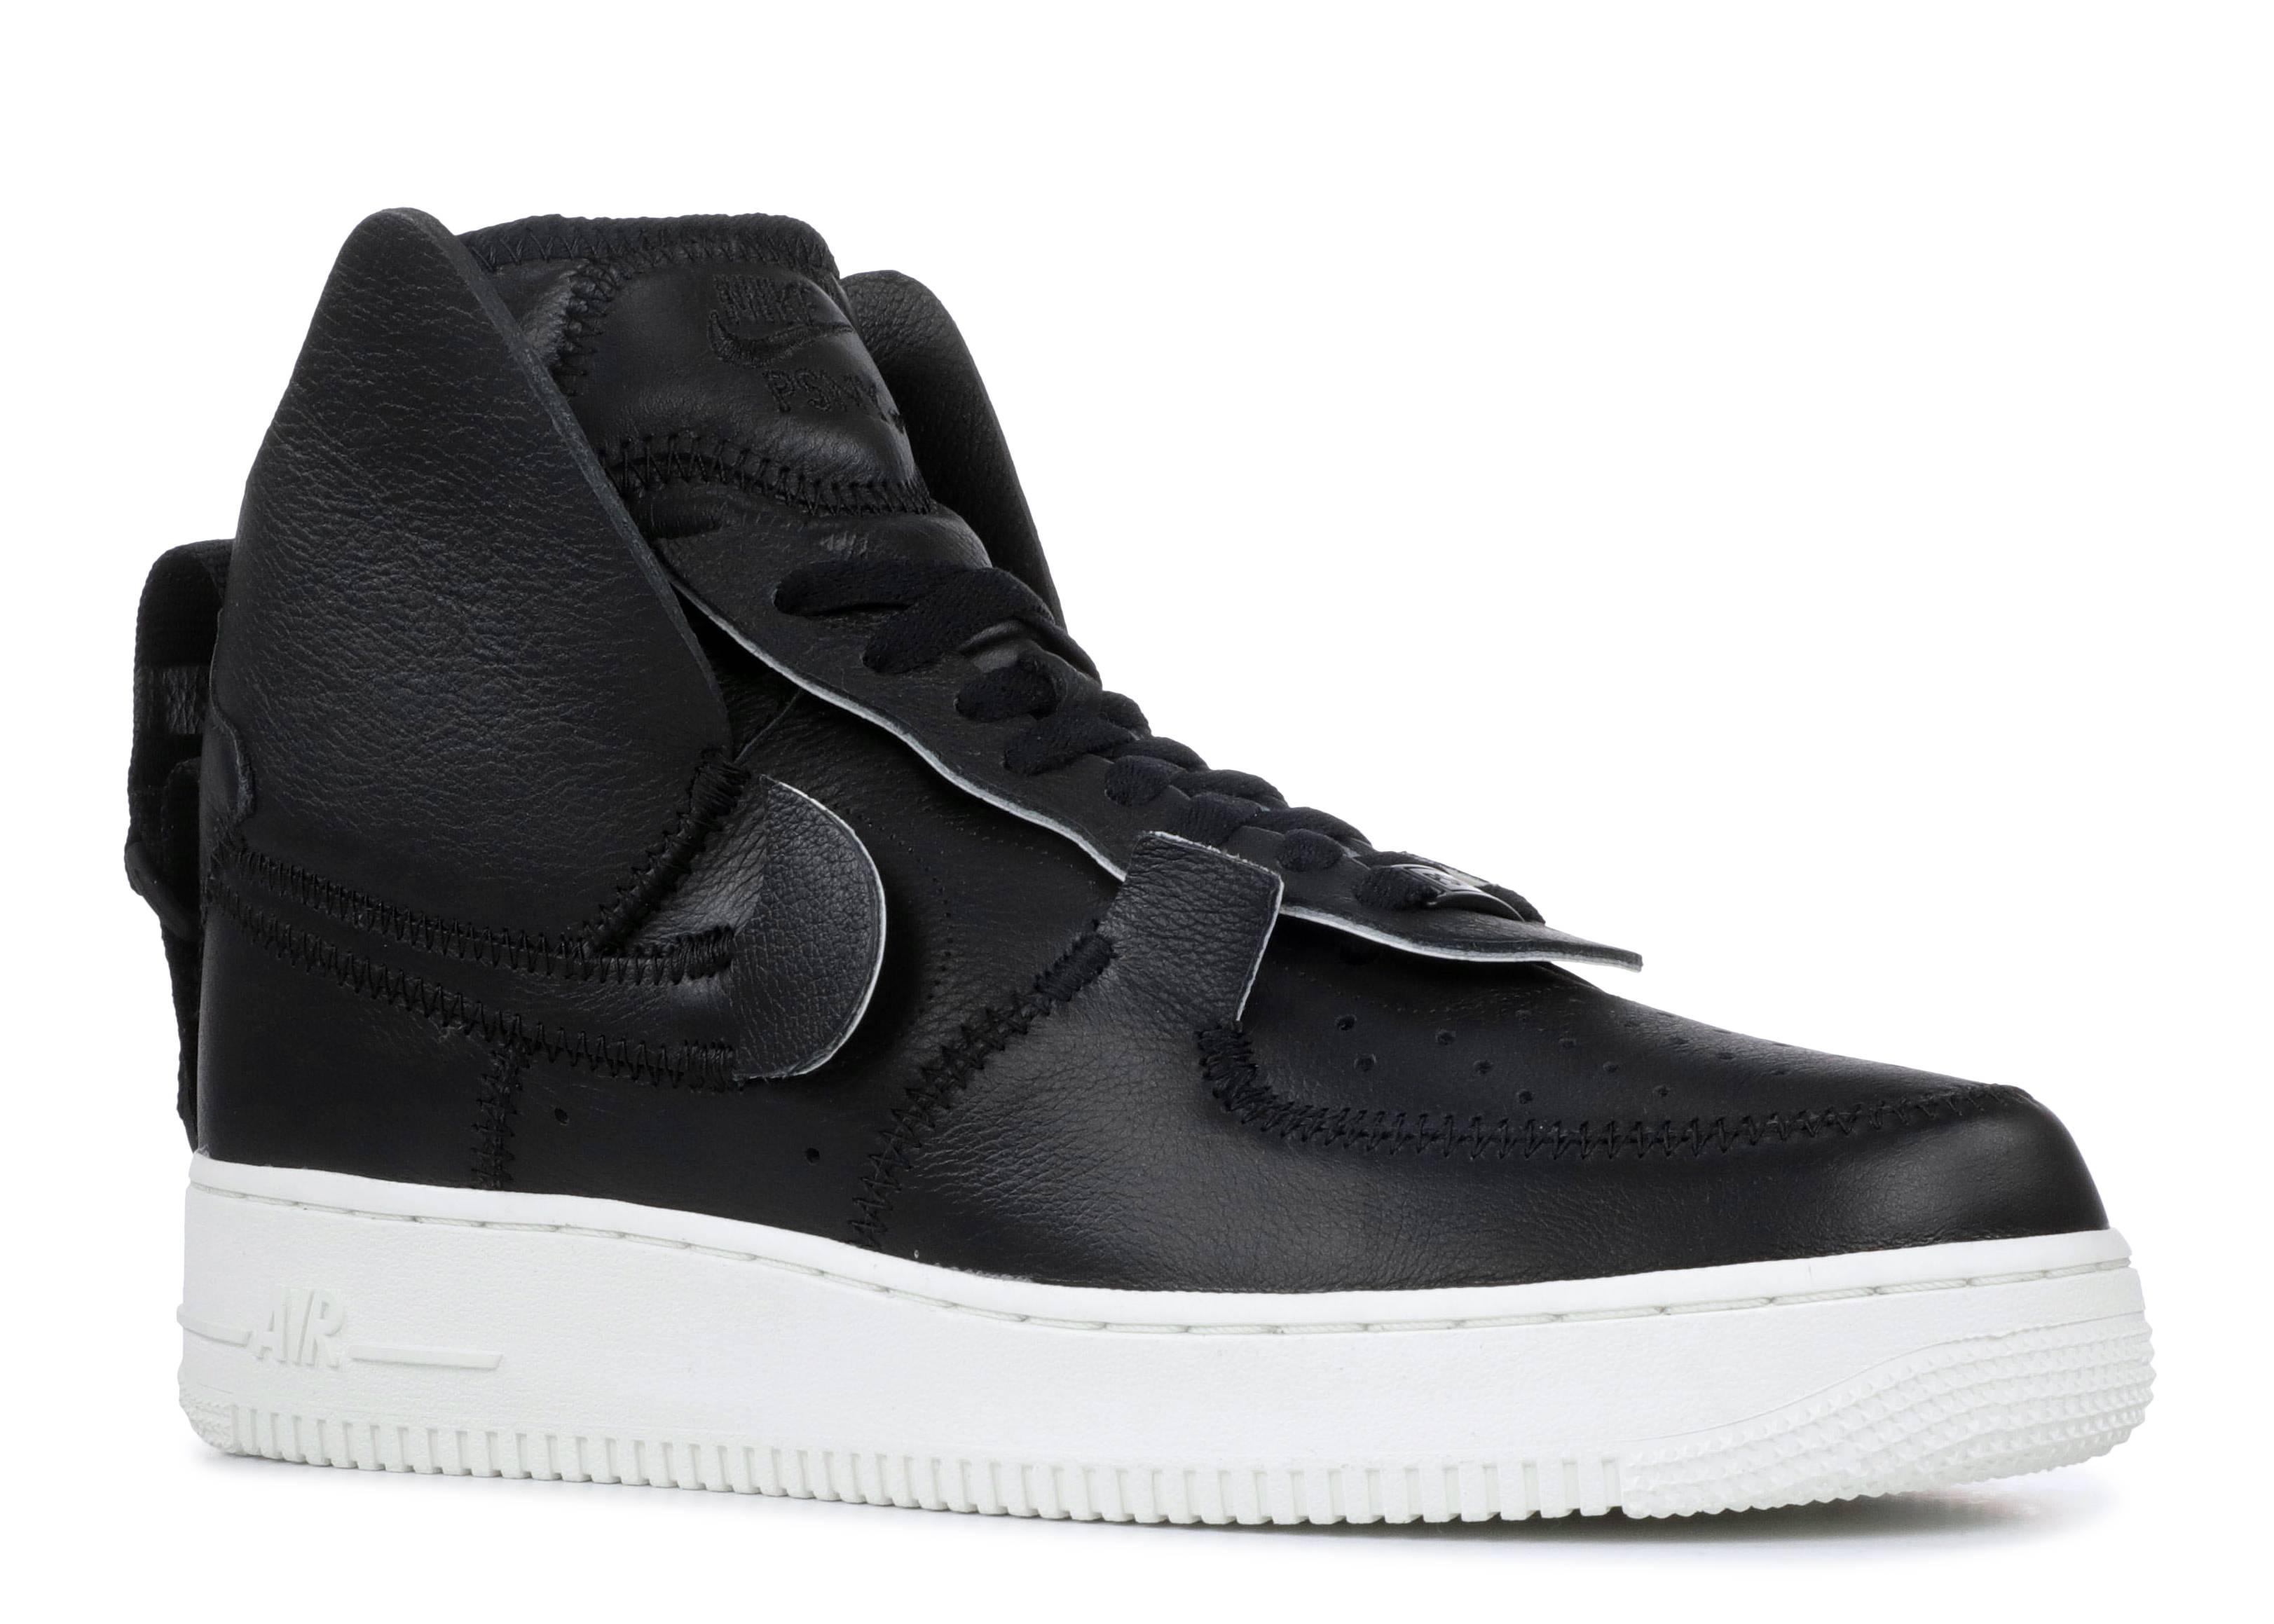 newest d7aa9 a877e Air Force 1 High PSNY - Nike - ao9292 002 - black black sail   Flight Club